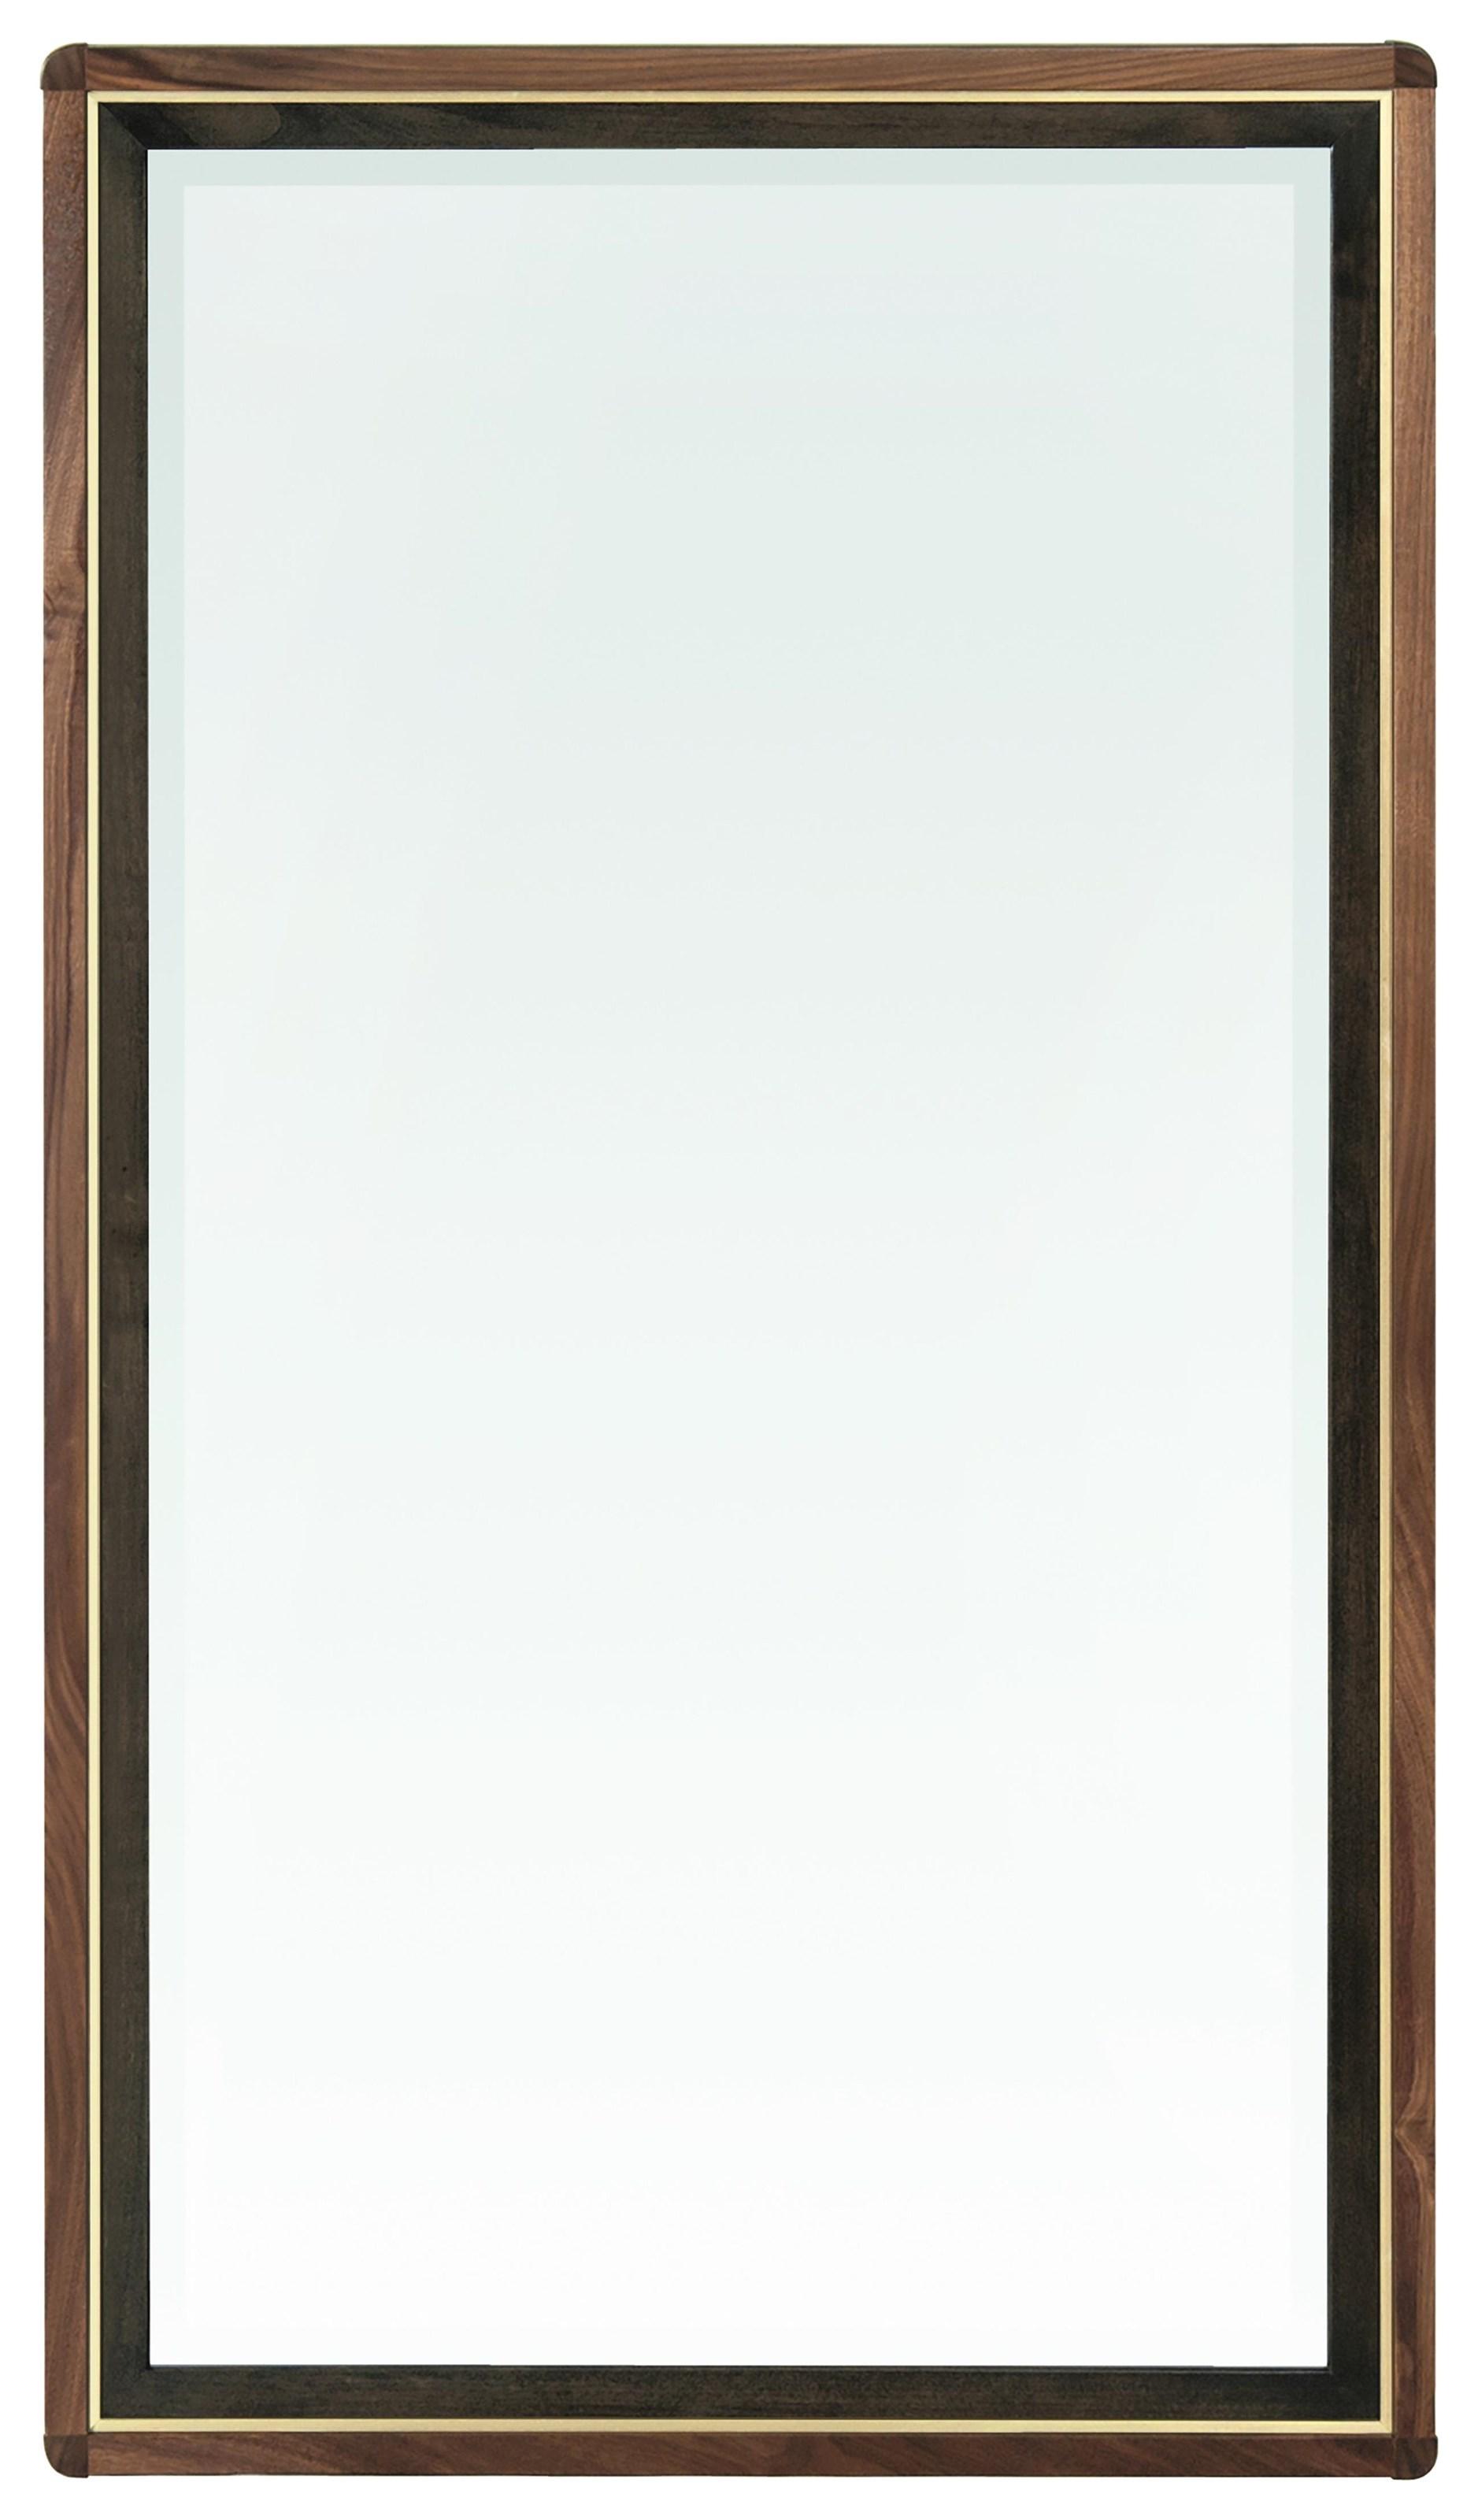 Bryce Mirror by Whittier Wood at Crowley Furniture & Mattress